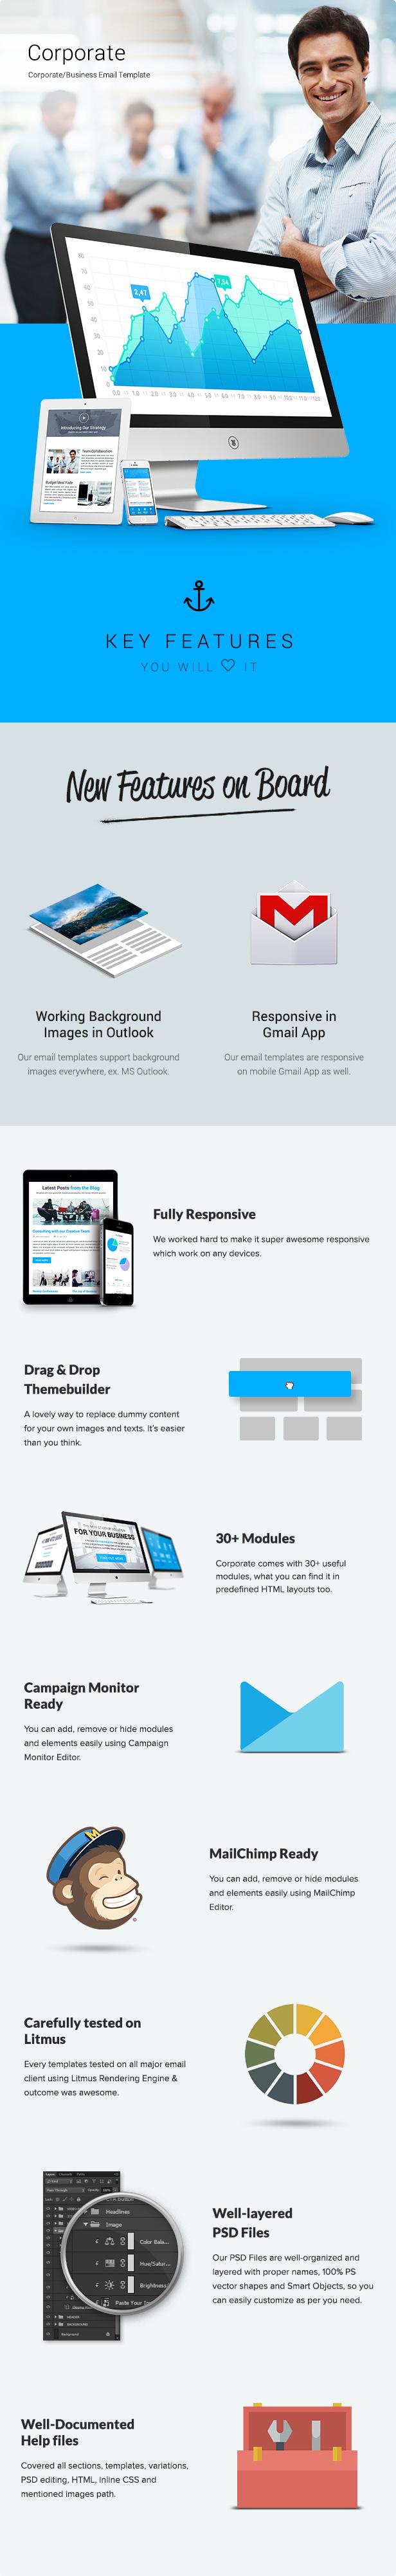 Corporate - Multipurpose B2B E-newsletter Template